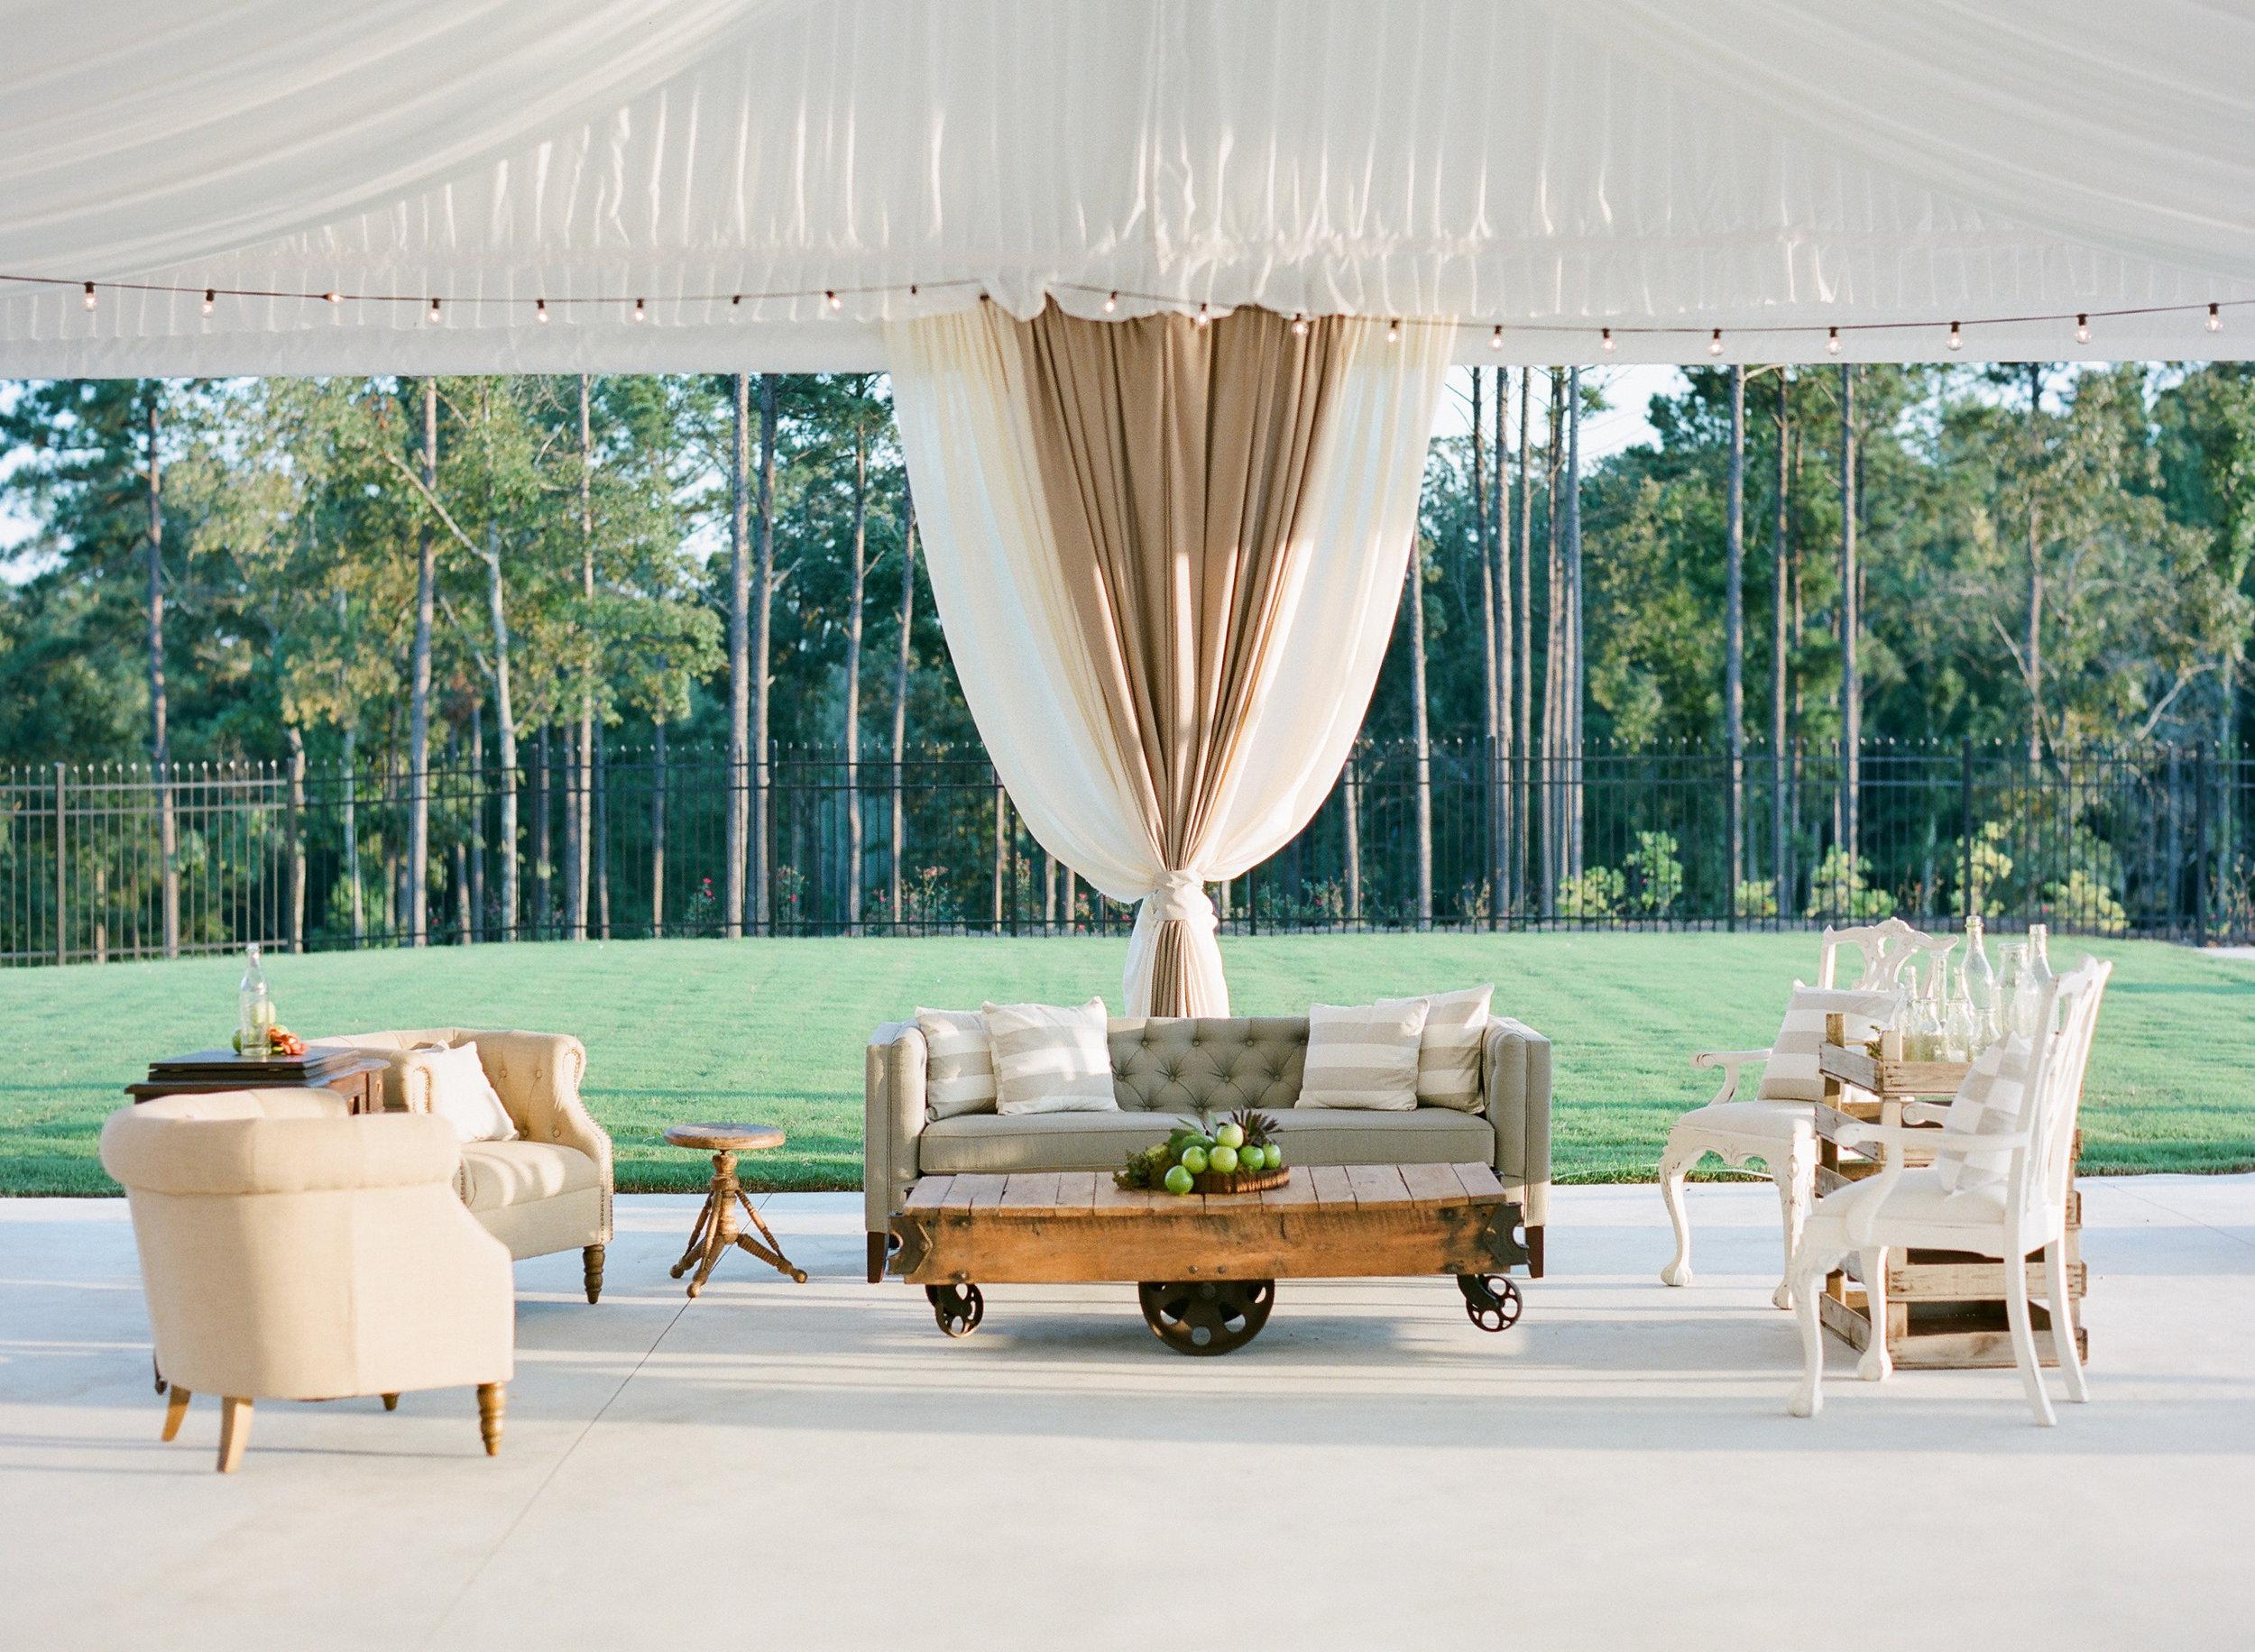 Simply-Charming-Socials_Atlanta-Wedding-Planner_Styled-Photo-Shoot_Modern-Luxury-Brides_Buffy-Dekmar-Photography_Ginny-Branch_Foxhall-Sporting-Club_6.jpg